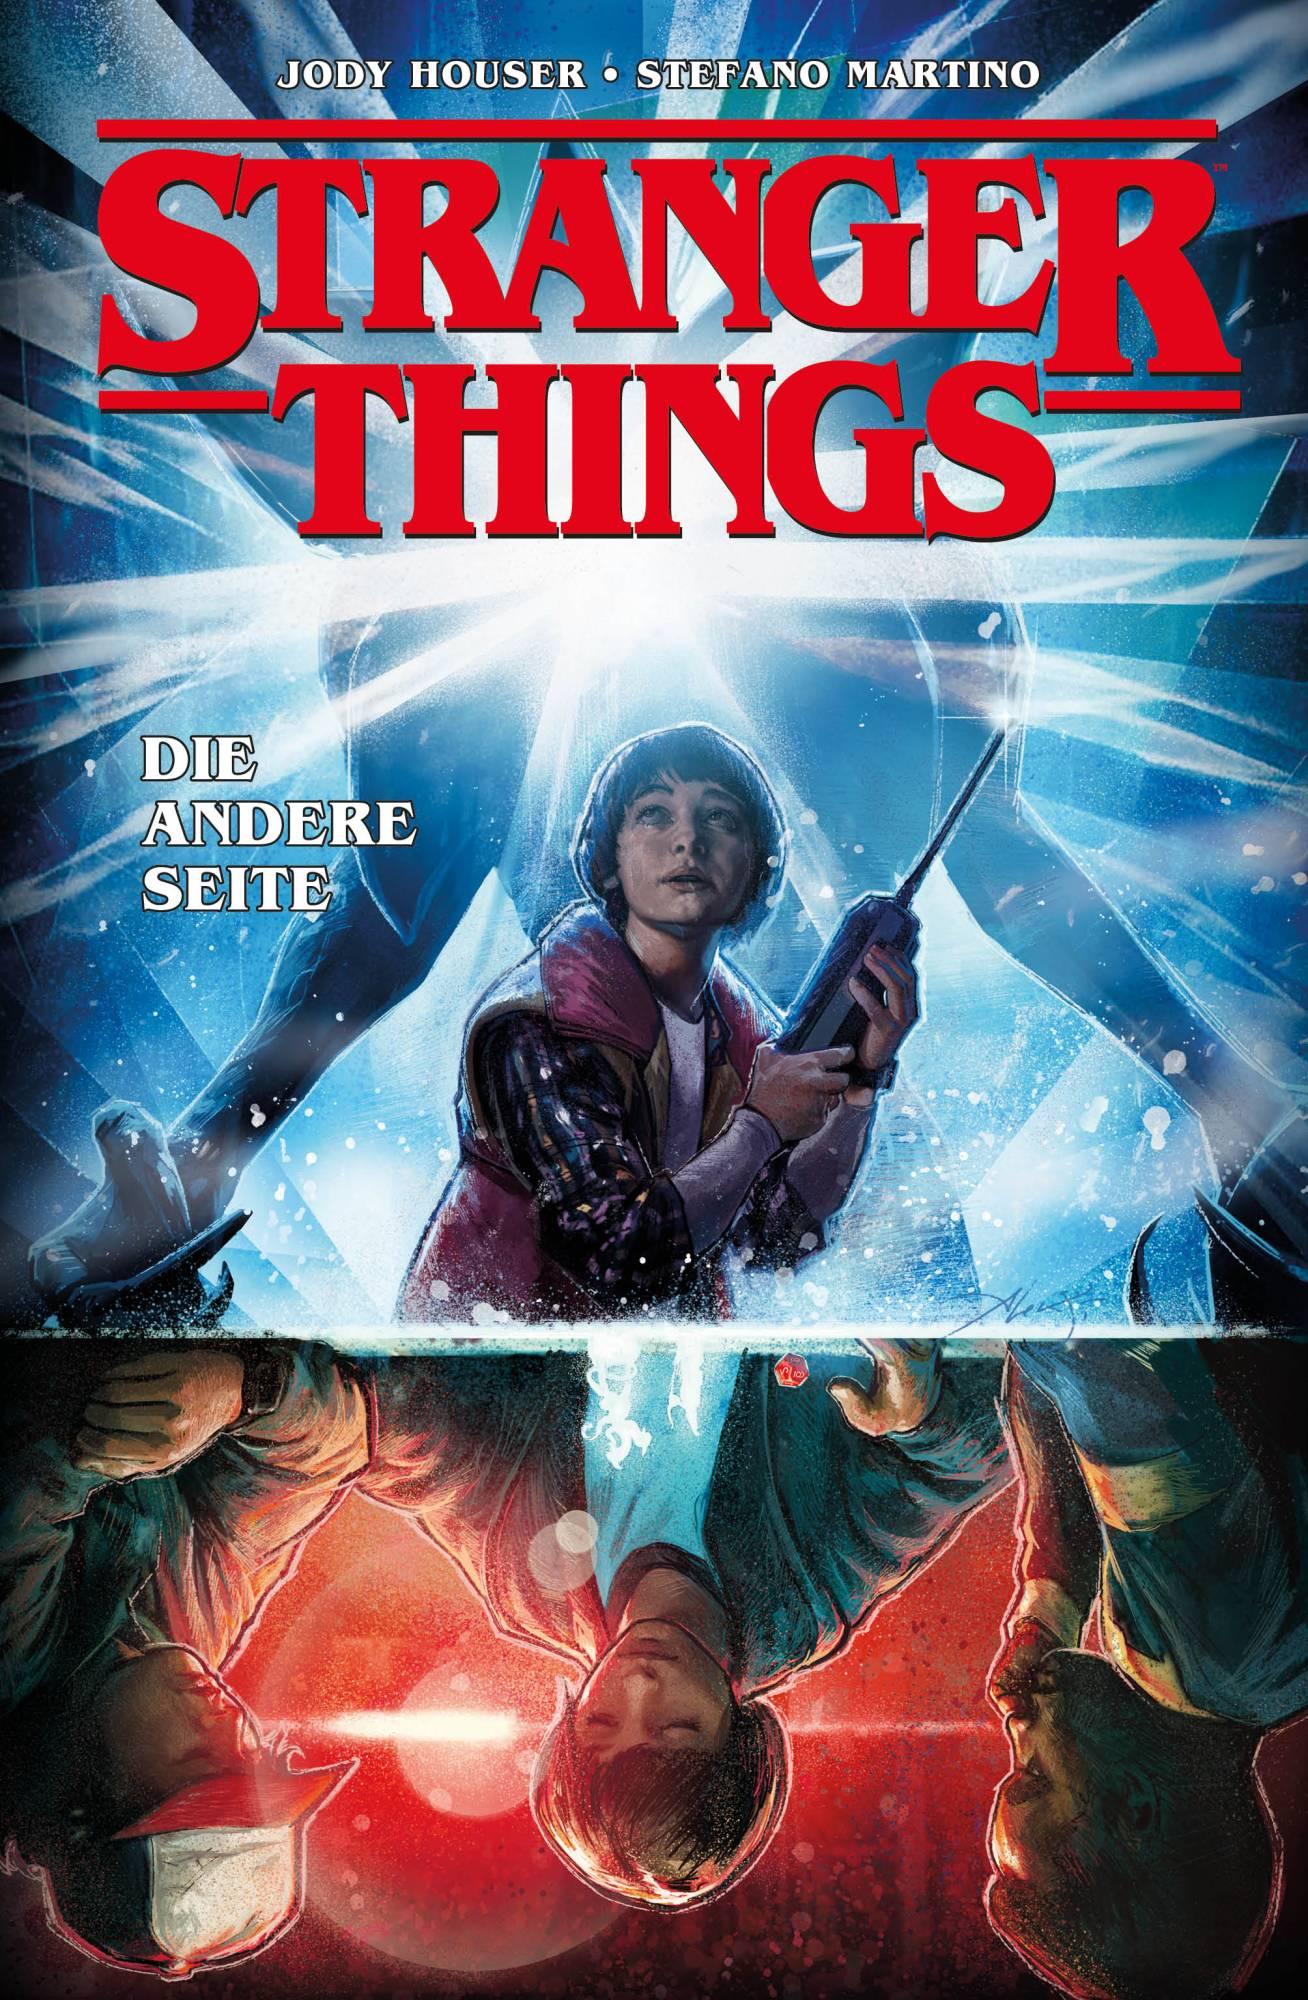 Stranger Things Bd. 1 - Die andere Seite